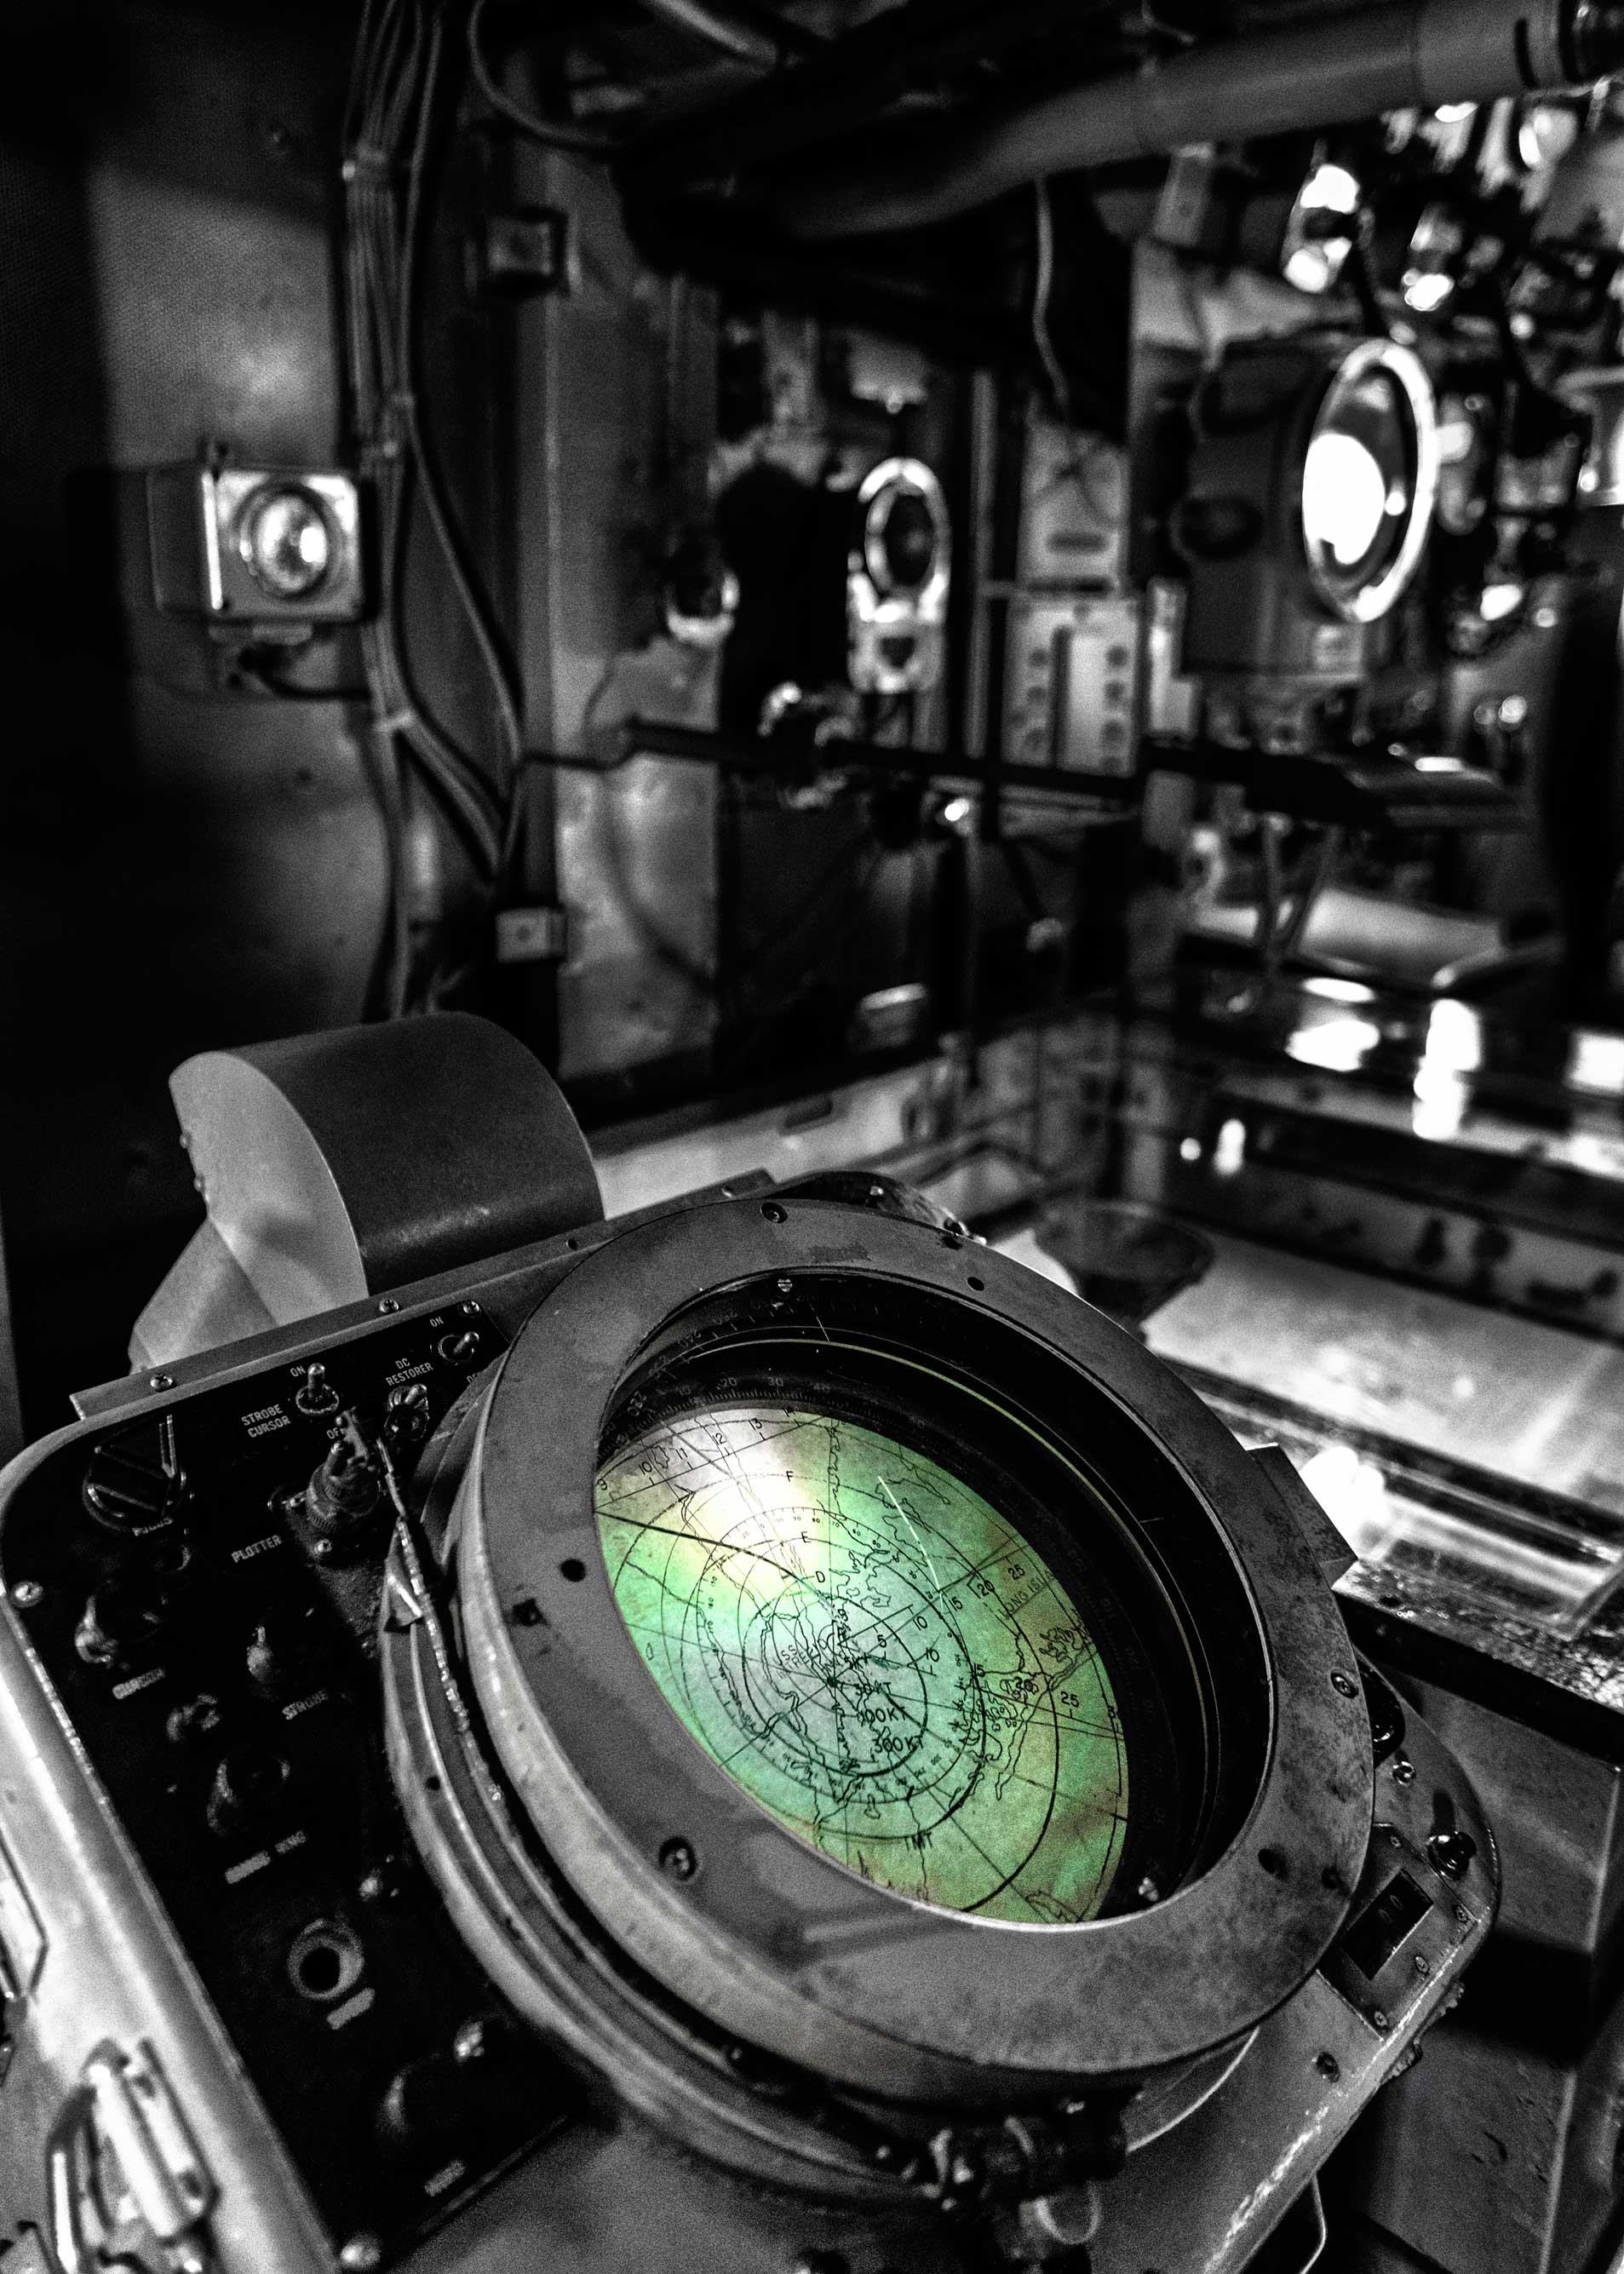 Intreped navigation web.jpg